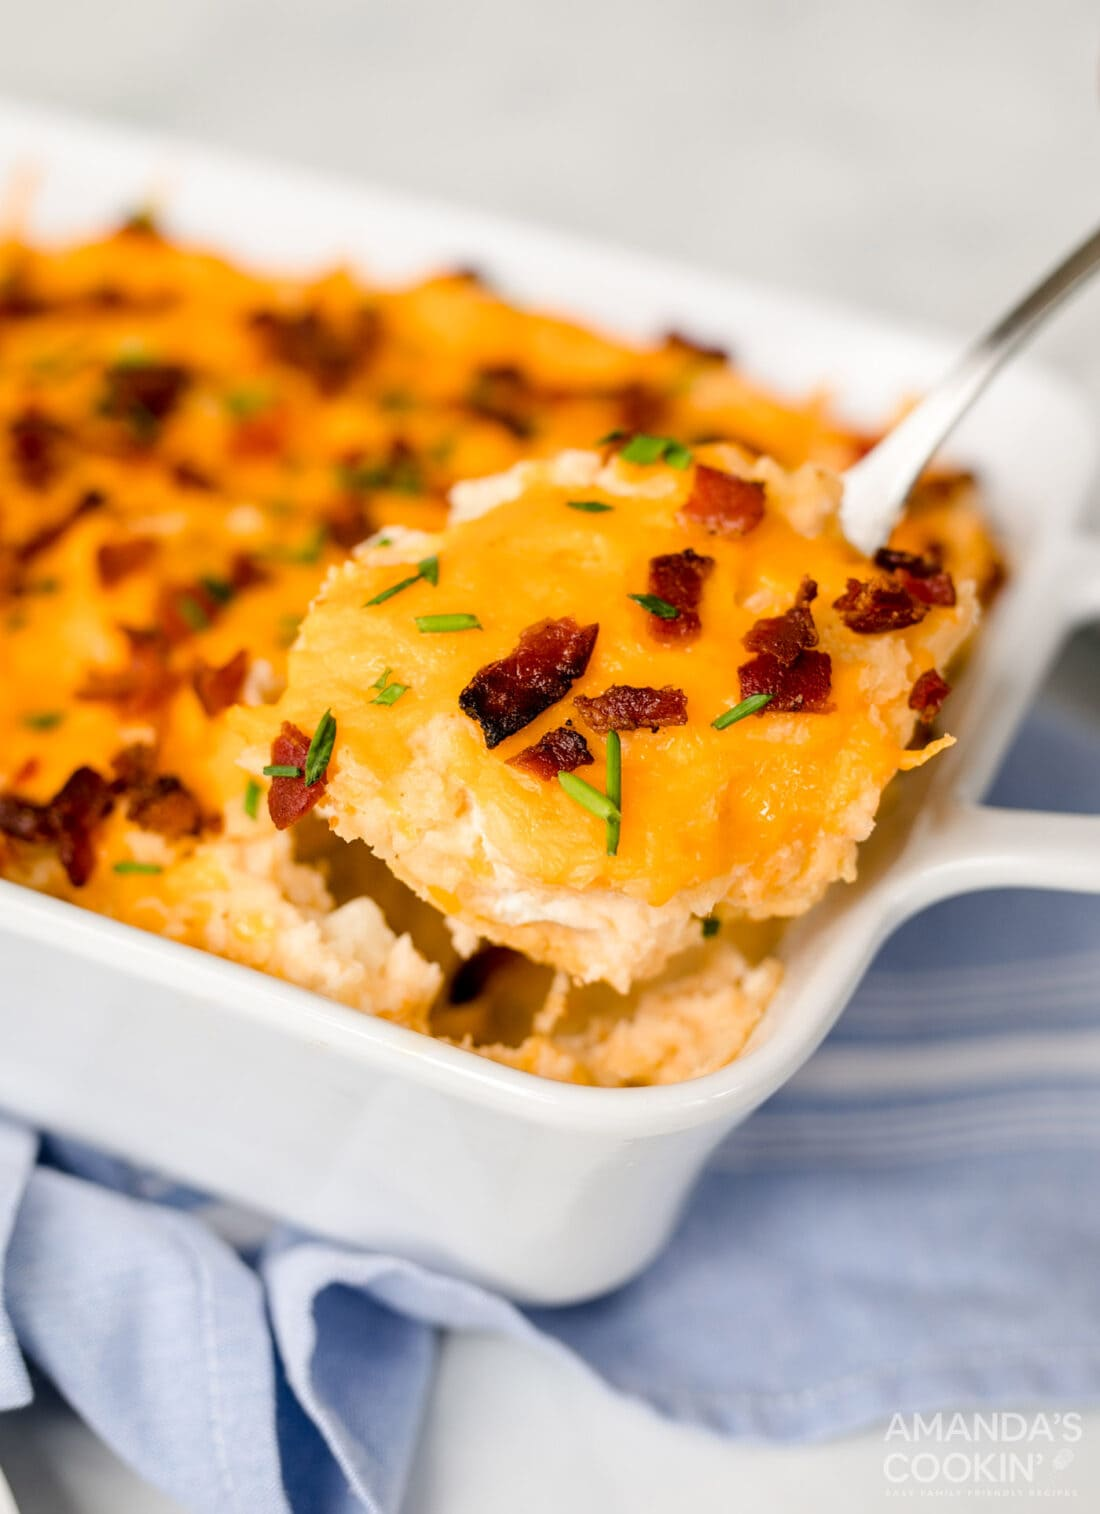 serving mashed potato casserole